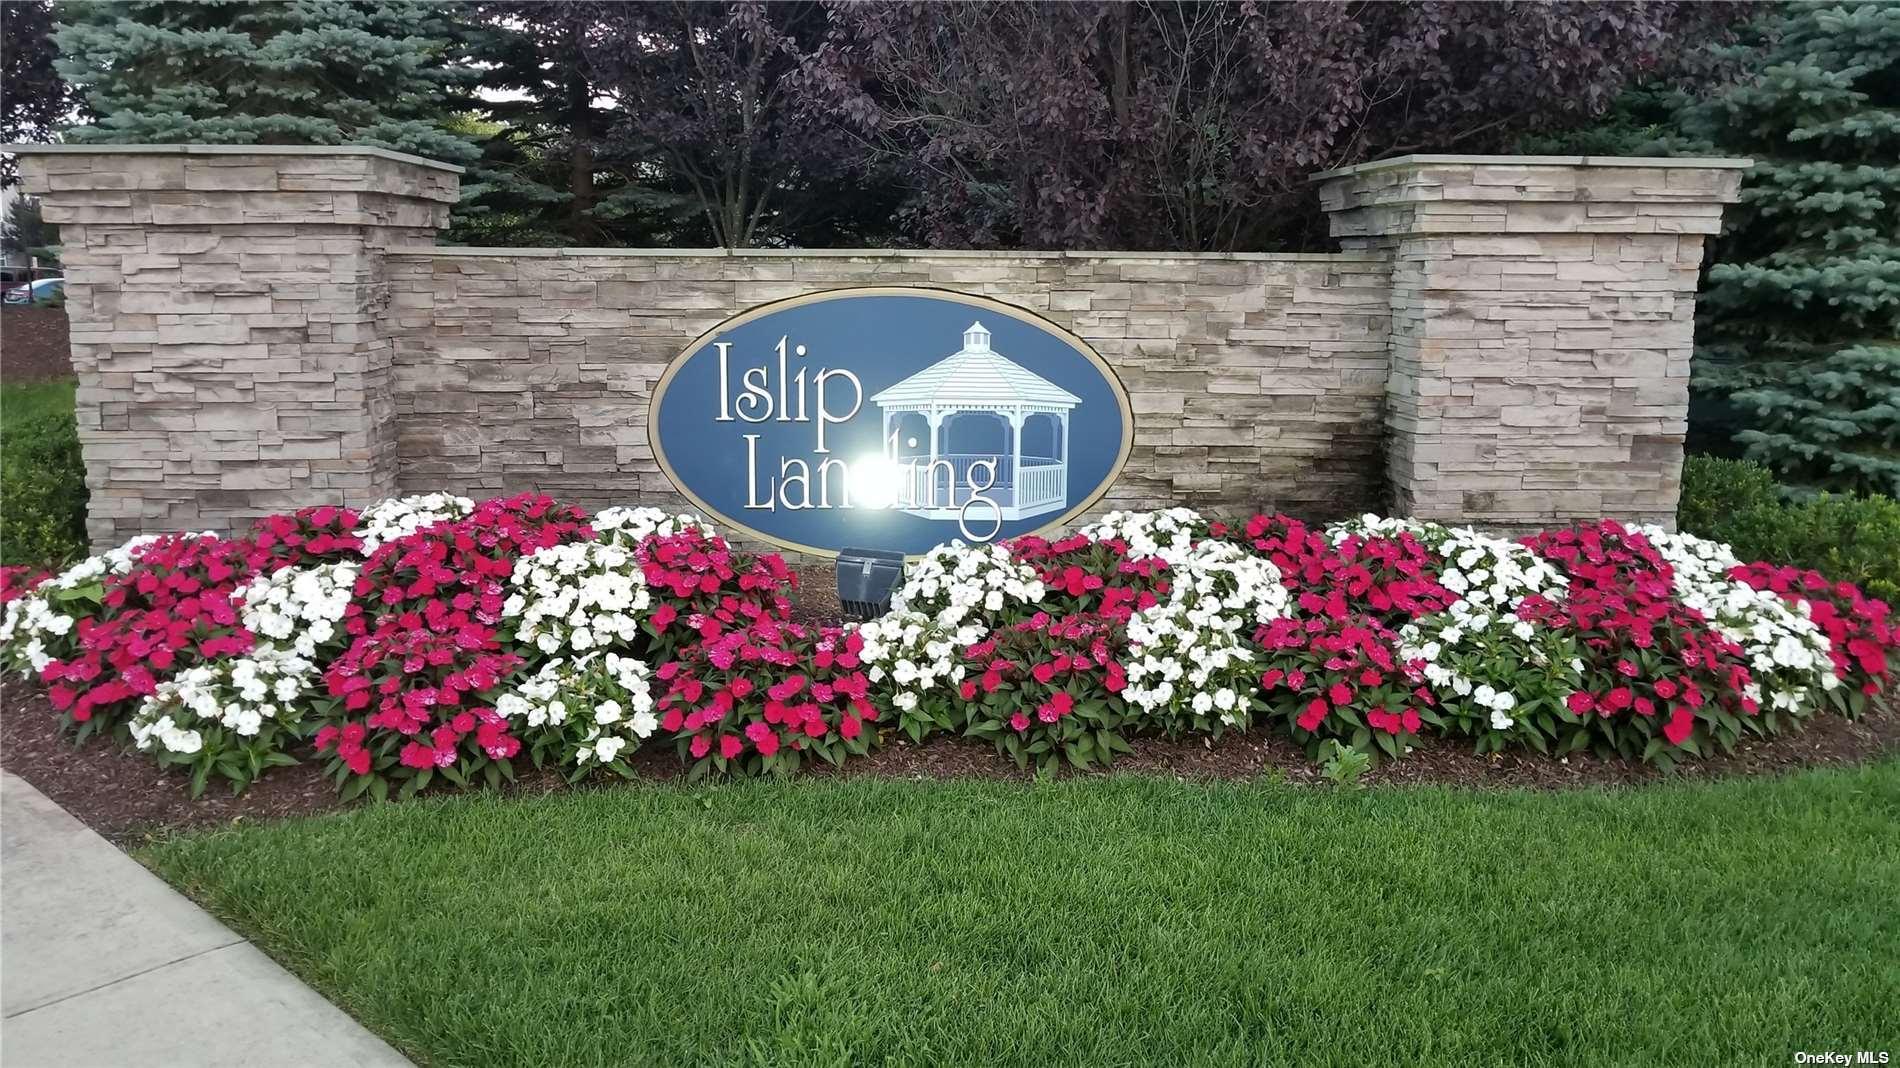 Listing in Central Islip, NY